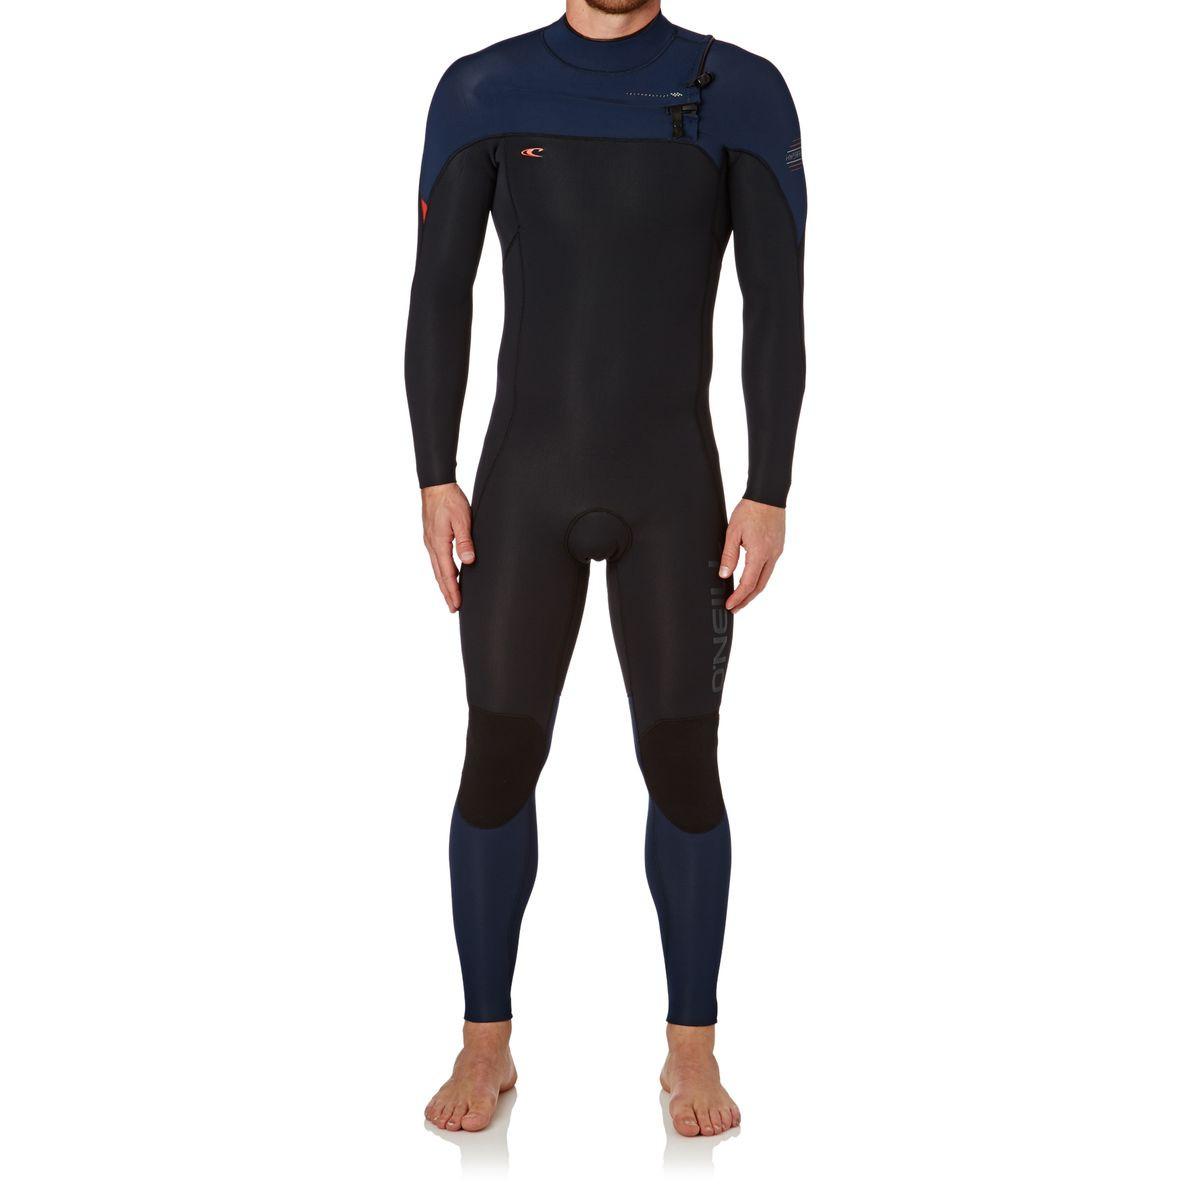 O'Neill Hyperfreak 4/3mm Chest Zip Wetsuit - Black/ Navy/ Neon Red